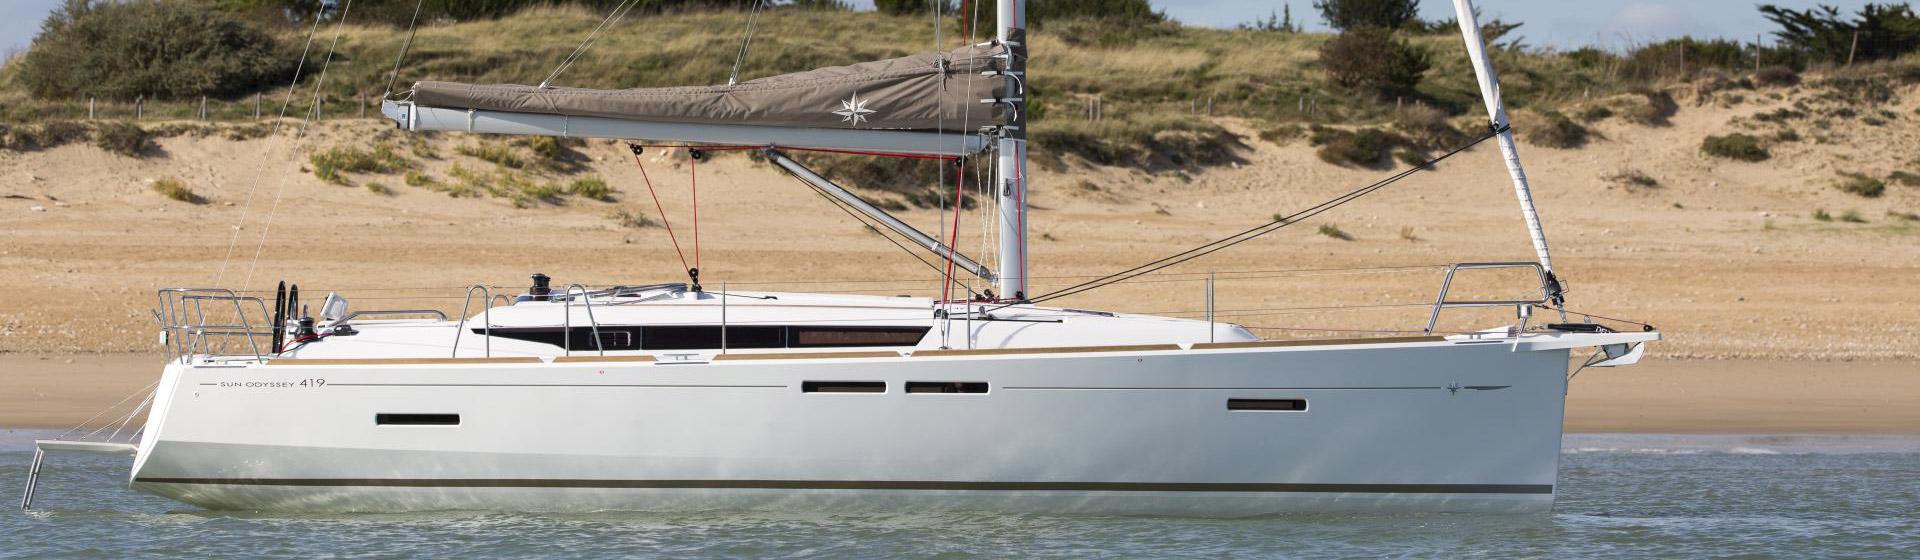 Voilier Jeanneau Sun Odyssee 419, voilier à Marseille, Yacht Méditerranée.